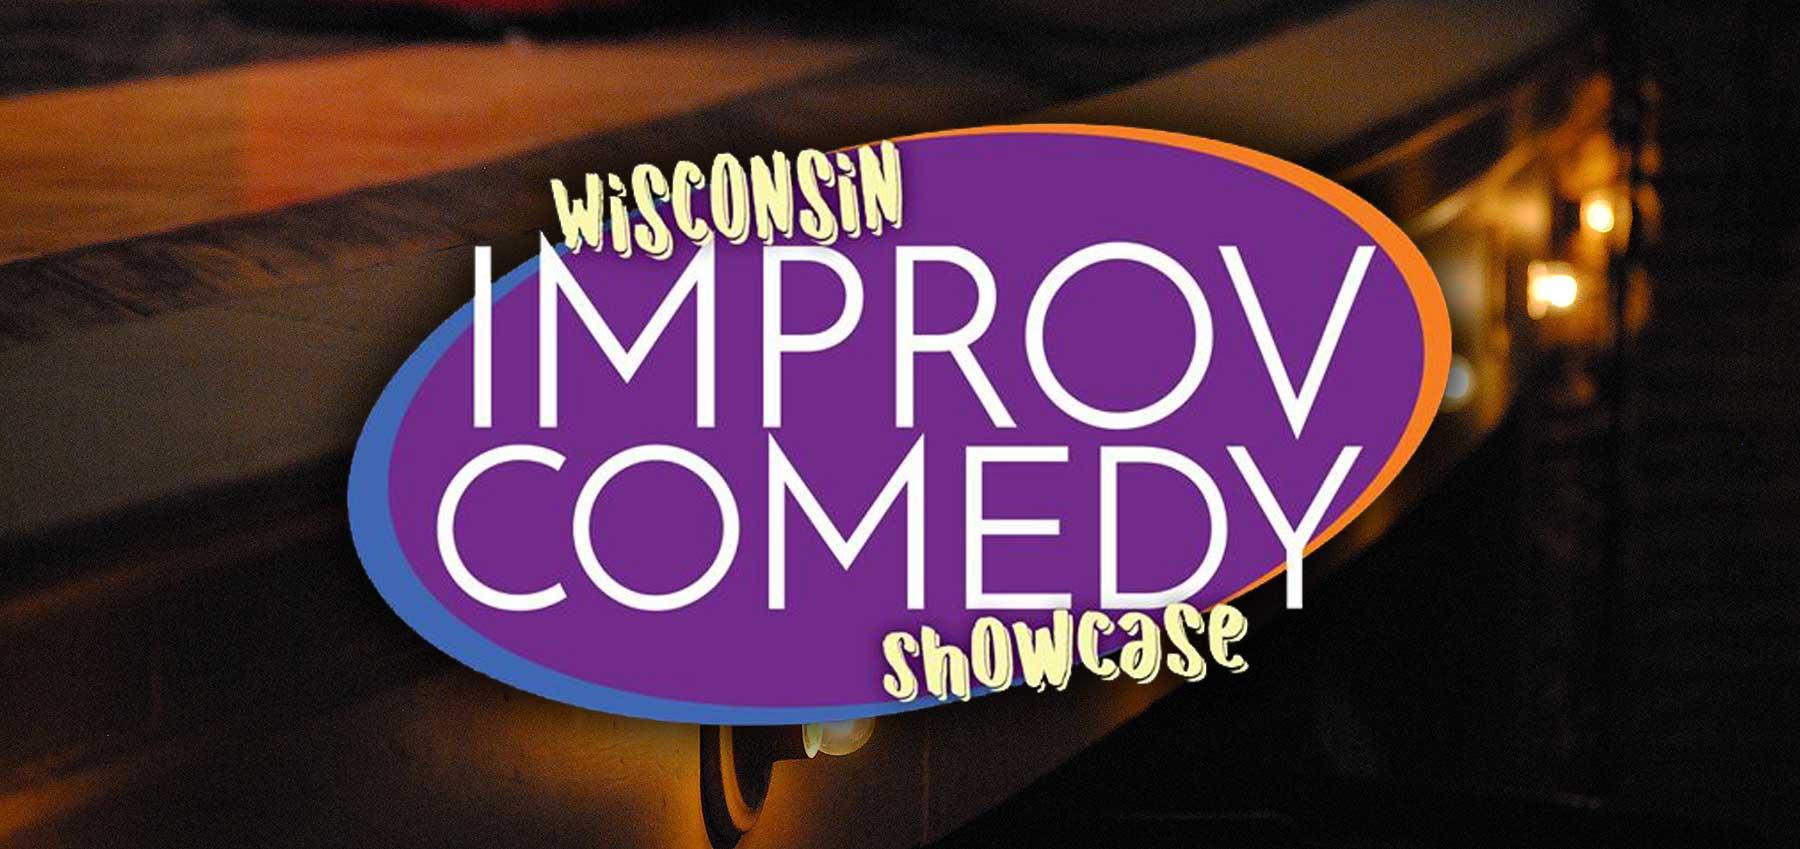 Wisconsin Improv Comedy Showcase